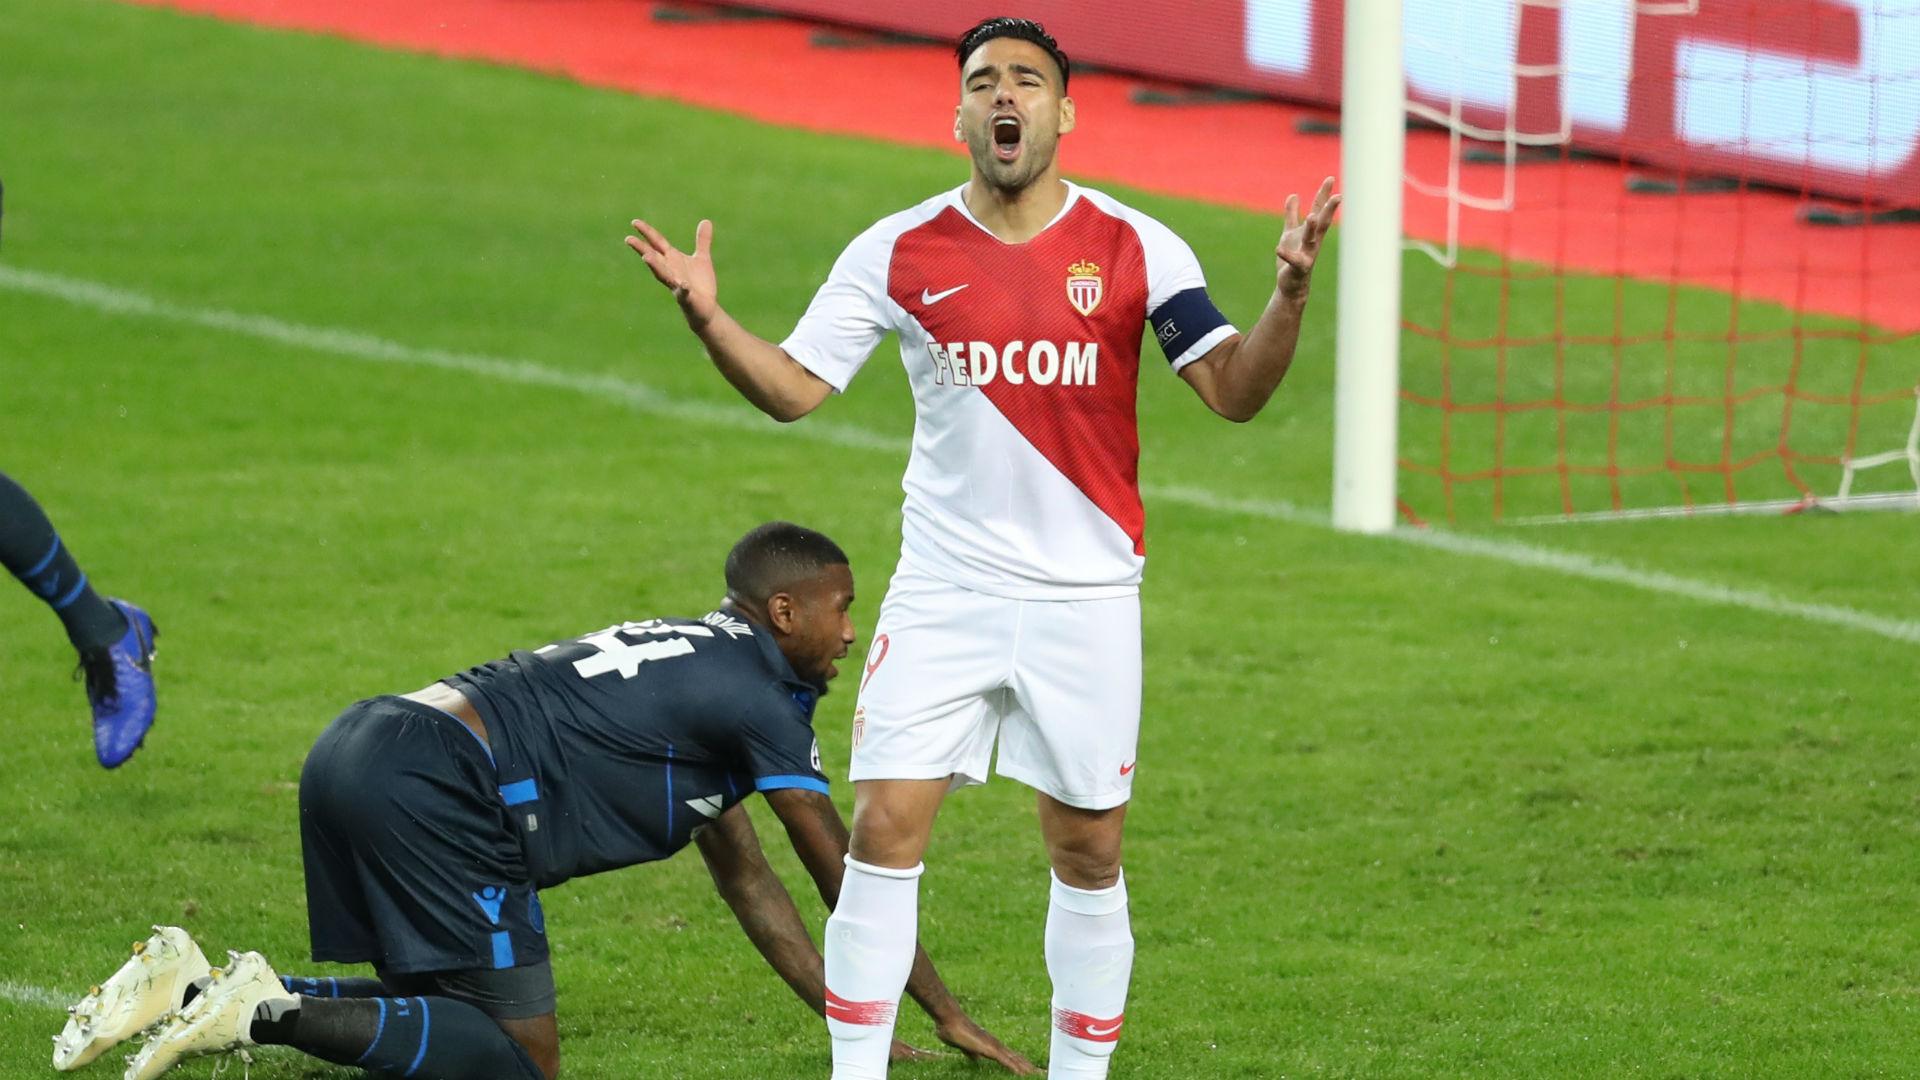 Radamel Falcao Monaco Bruges